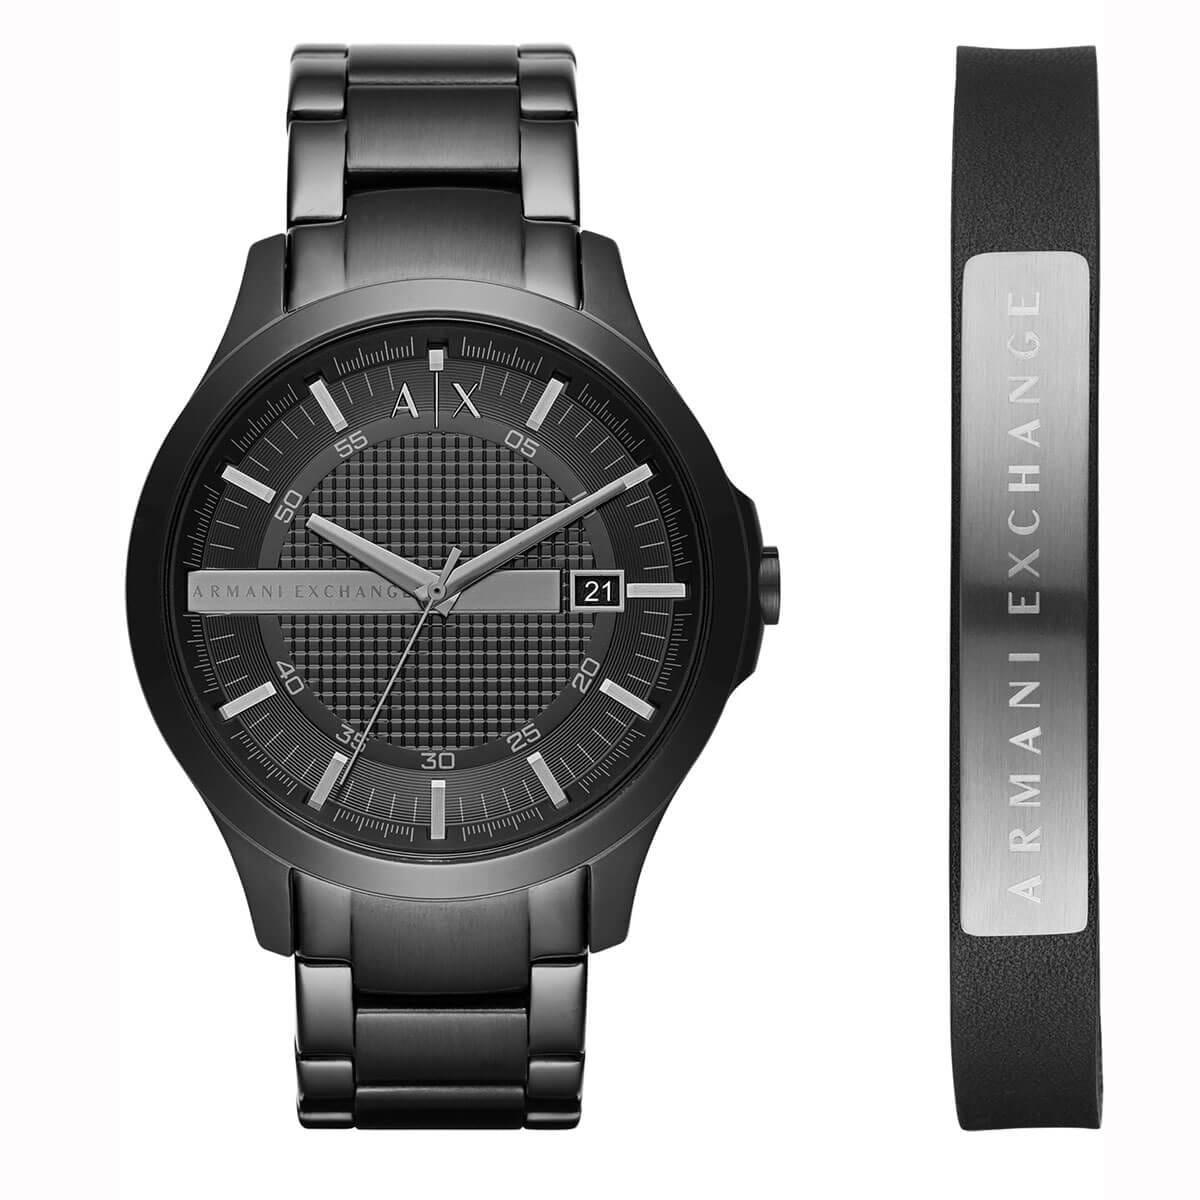 Reloj Caballero Armani Exchange Ax7101